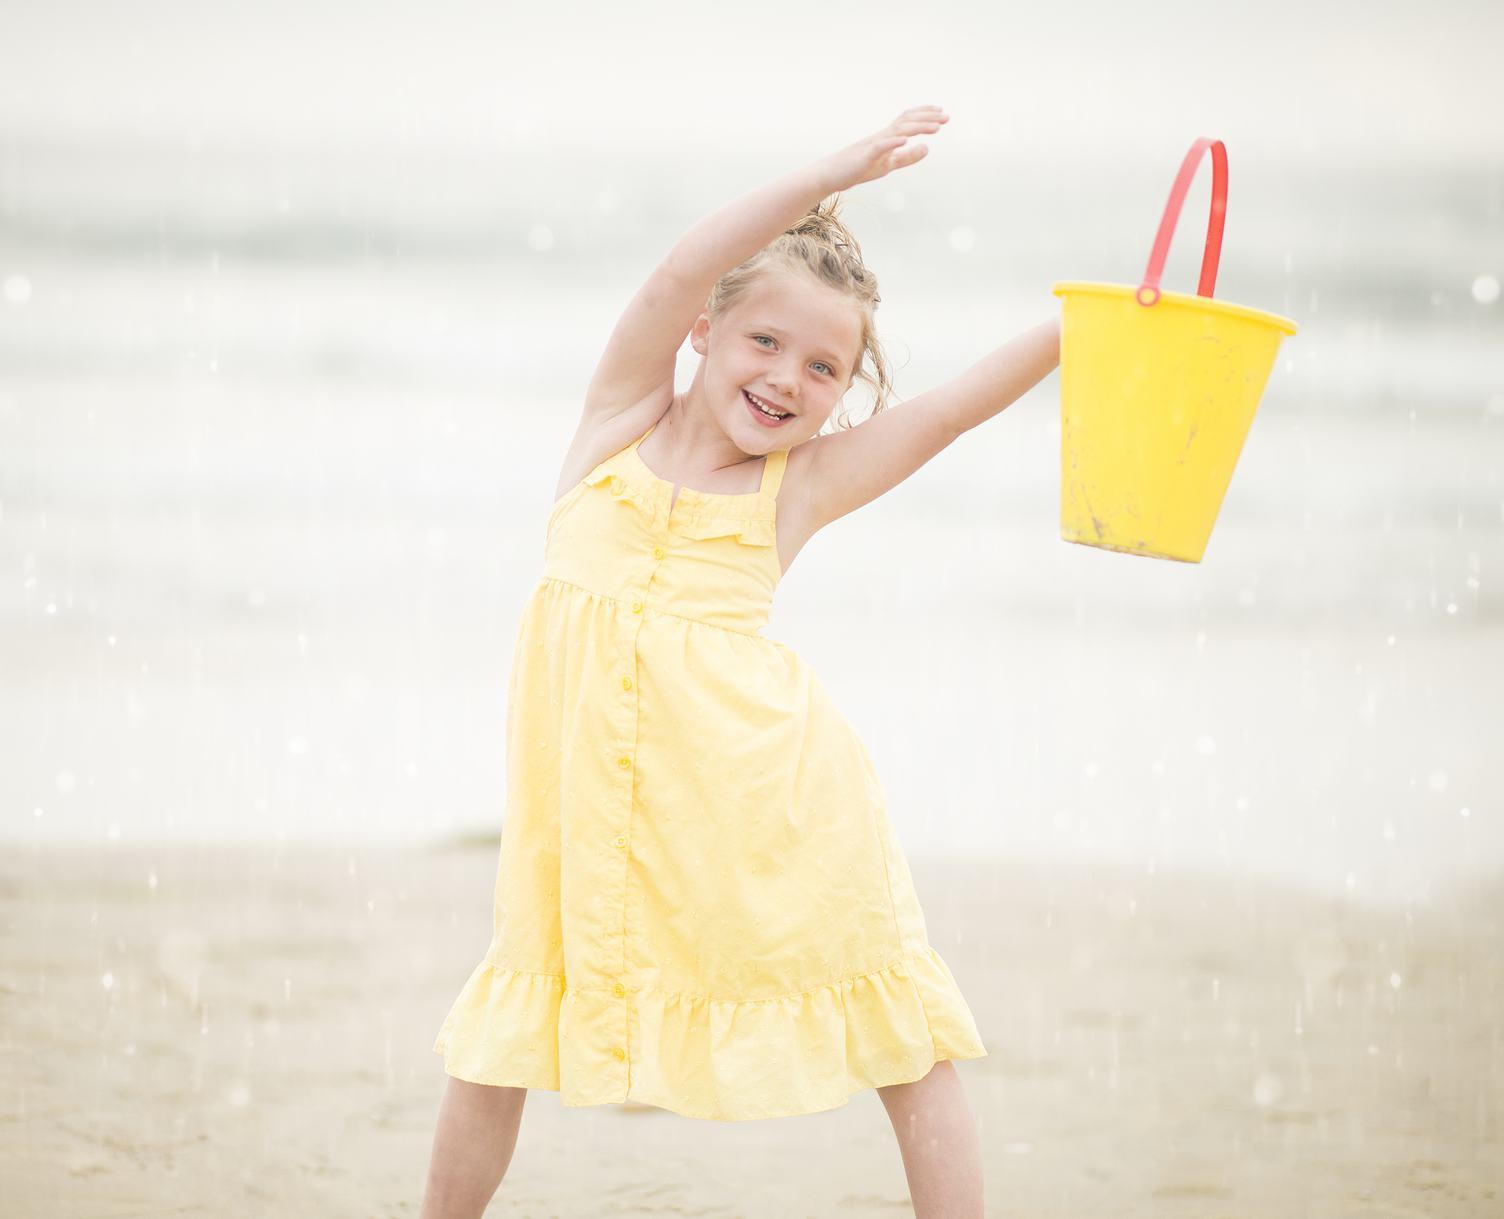 Girl in Yellow Dress Having Fun Playing on a Beach with Bucket